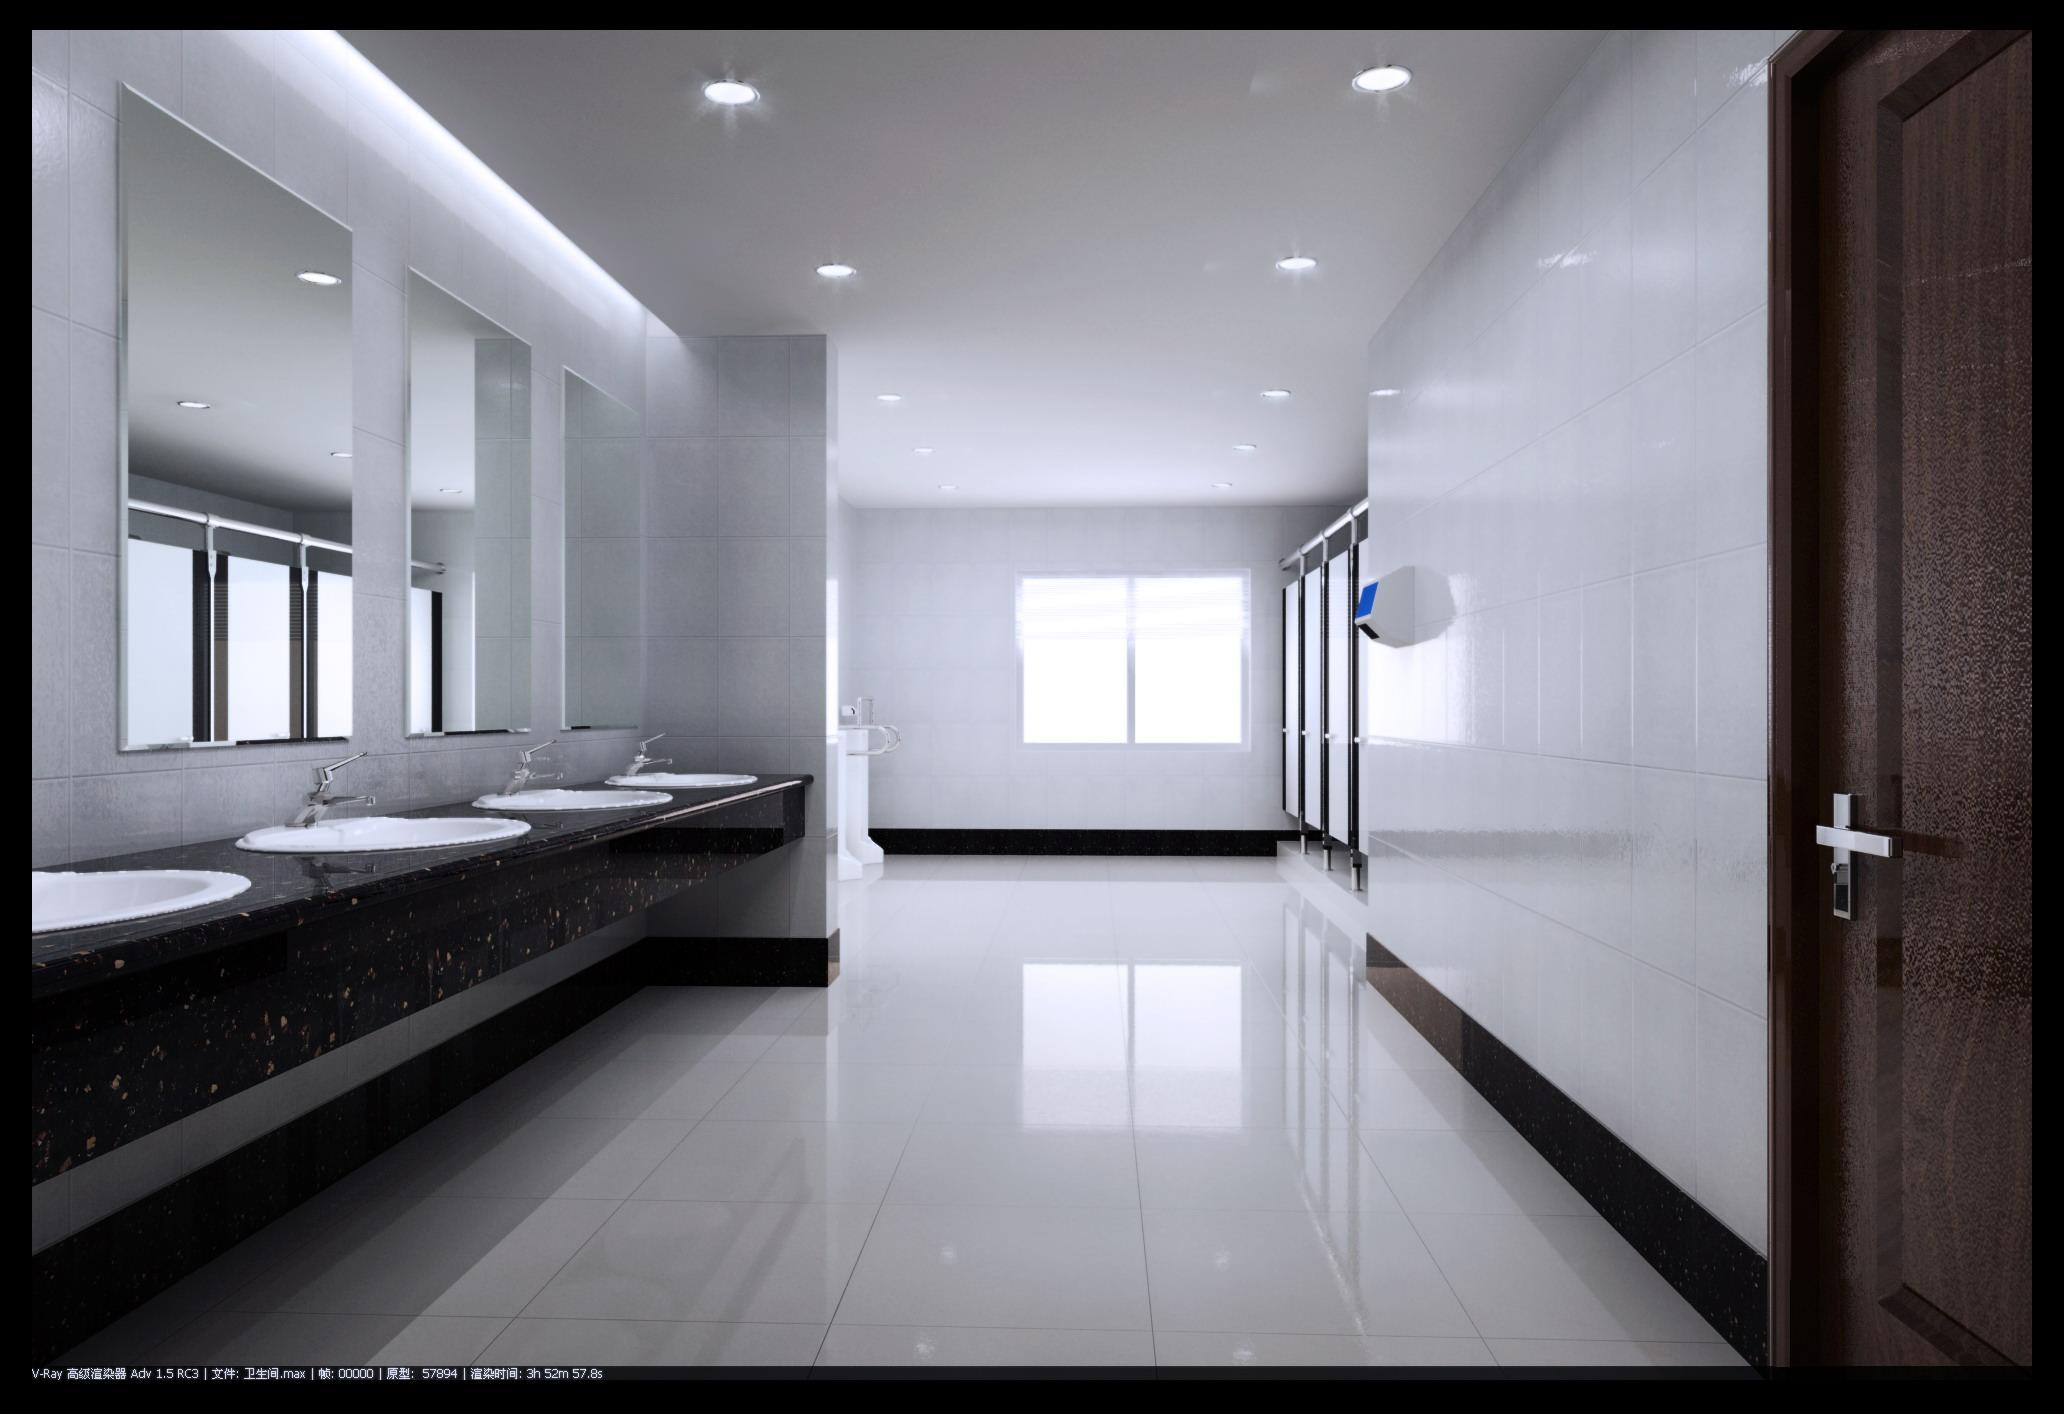 Great Bathroom Rentals Cost Tall Mosaic Bathrooms Design Flat Bath Room Floor Freestanding Bathroom Vanity Units Old Bathtub Ceramic Paint BrightTall Bathroom Vanity Height Craftsman Bathroom